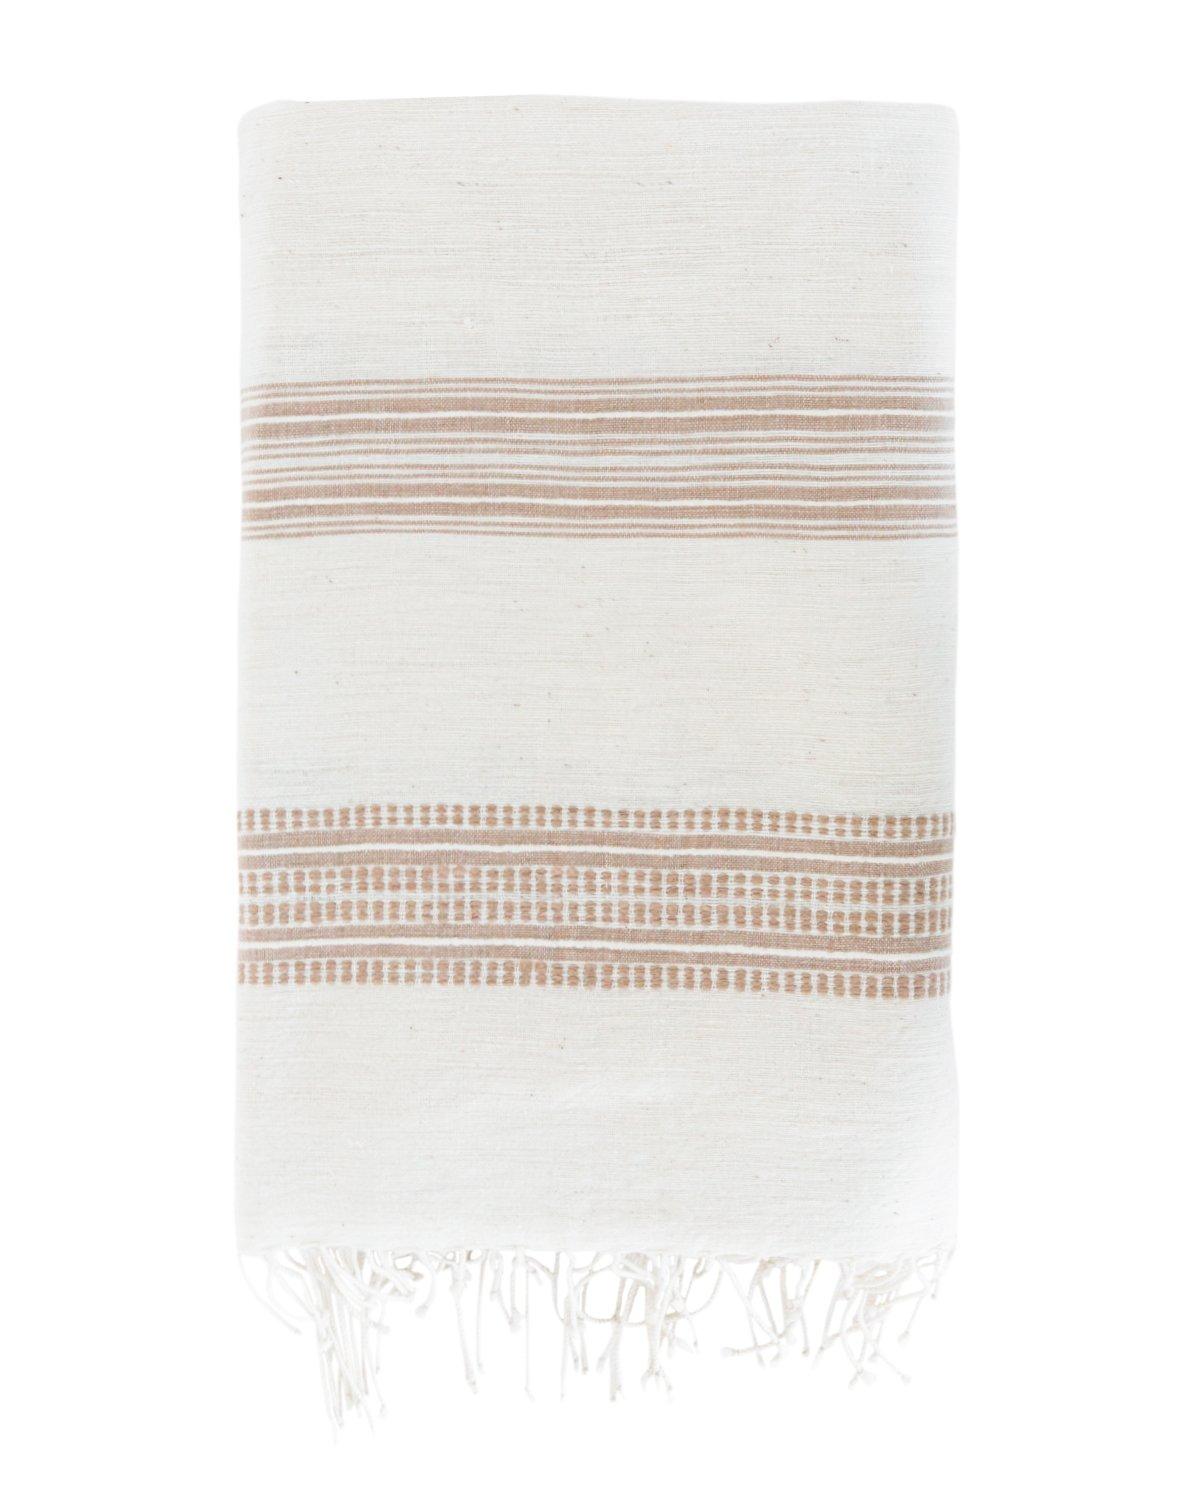 Coronado_Bath_Towel_4_226bc0a5-e5b6-4735-a330-b5f8168b2e15.jpg